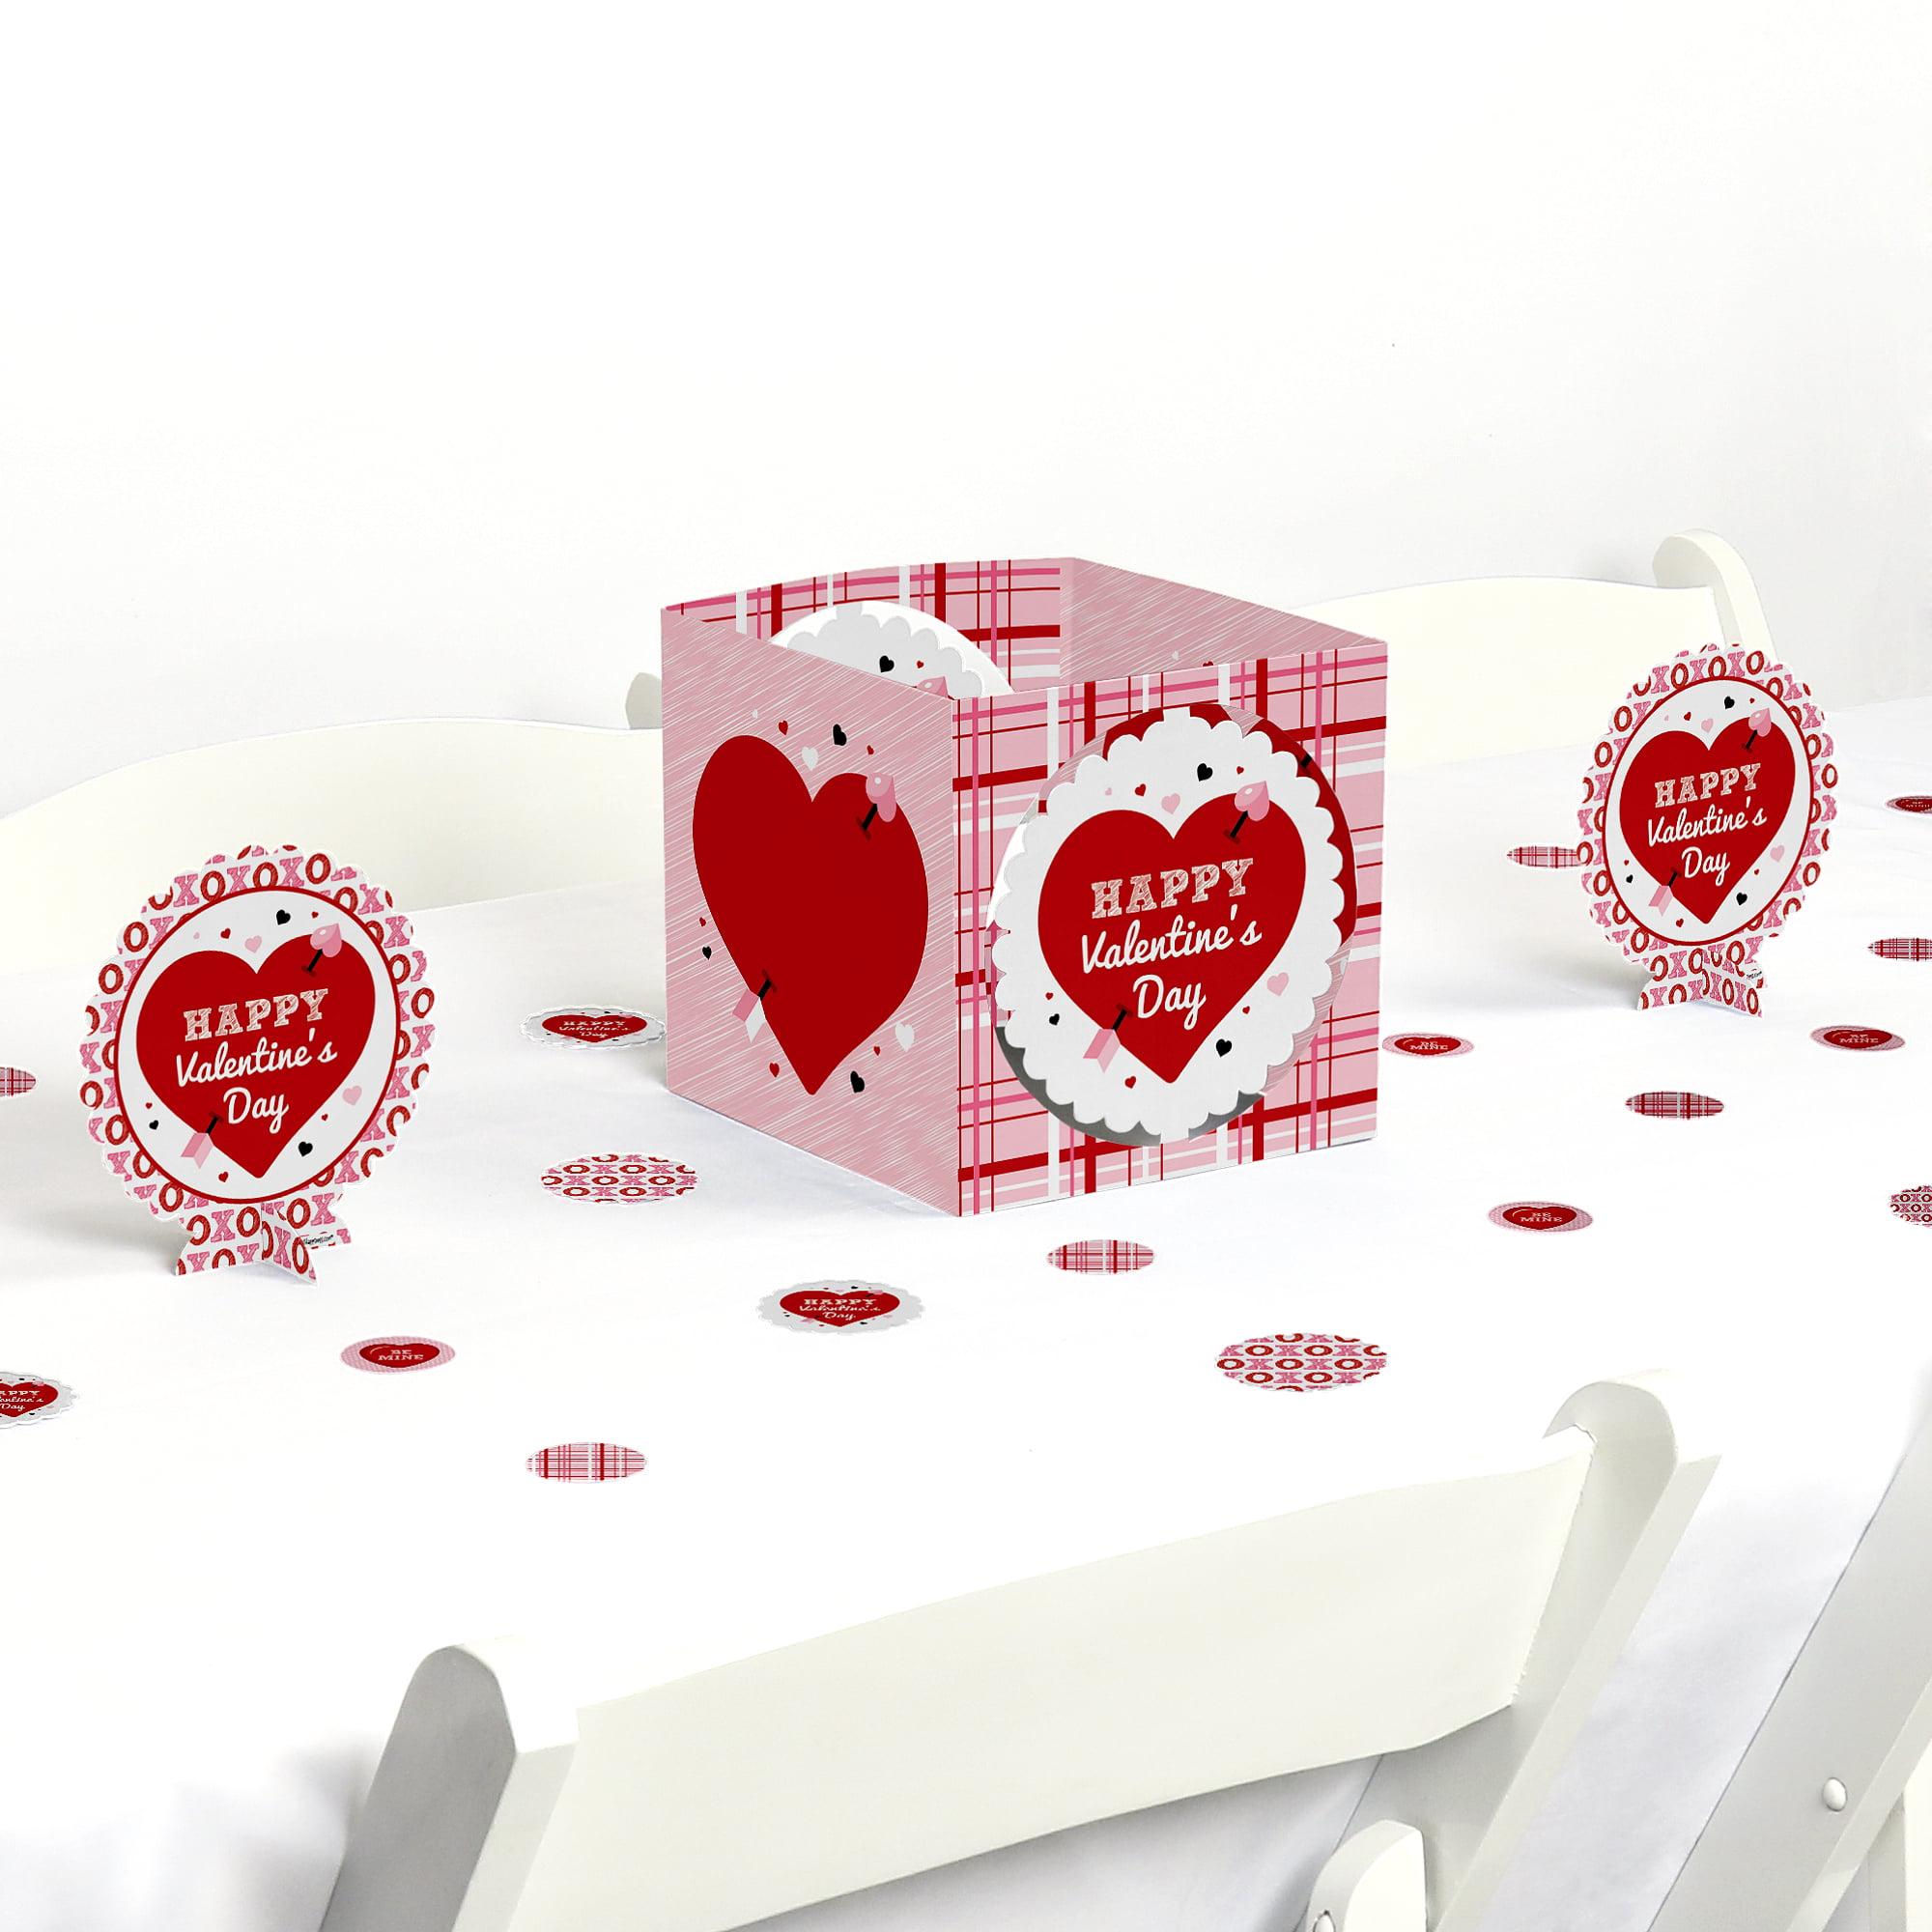 Conversation Hearts - Valentine's Day Party Centerpiece & Table Decoration Kit